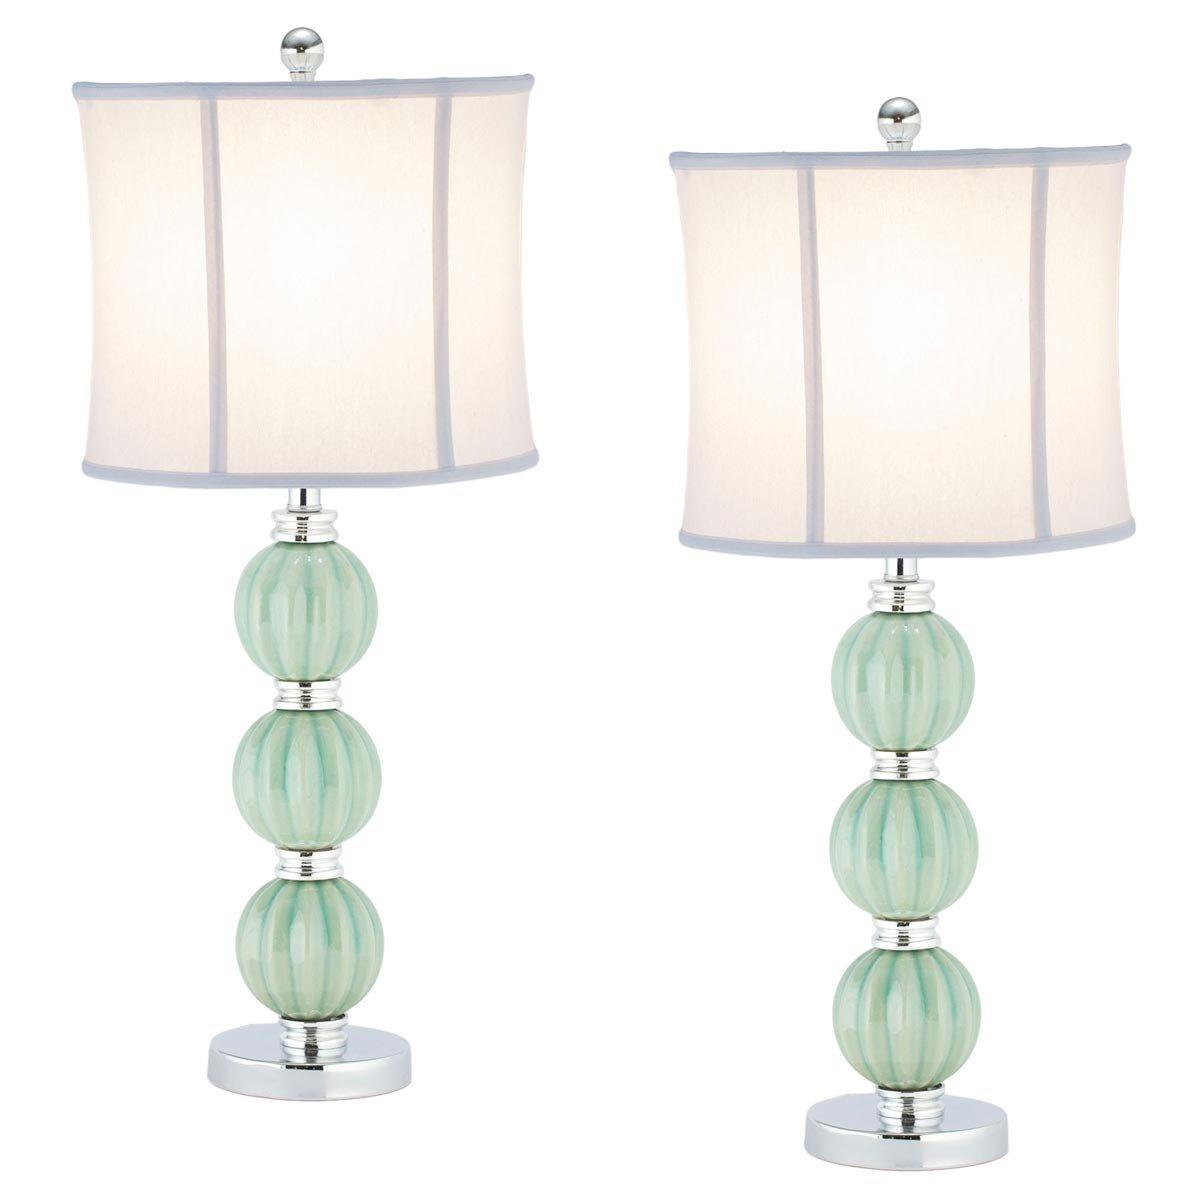 Amazon.com: Safavieh Lighting Collection Stephanie Green Globe 25 Inch  Table Lamp (Set Of 2): Kitchen U0026 Dining